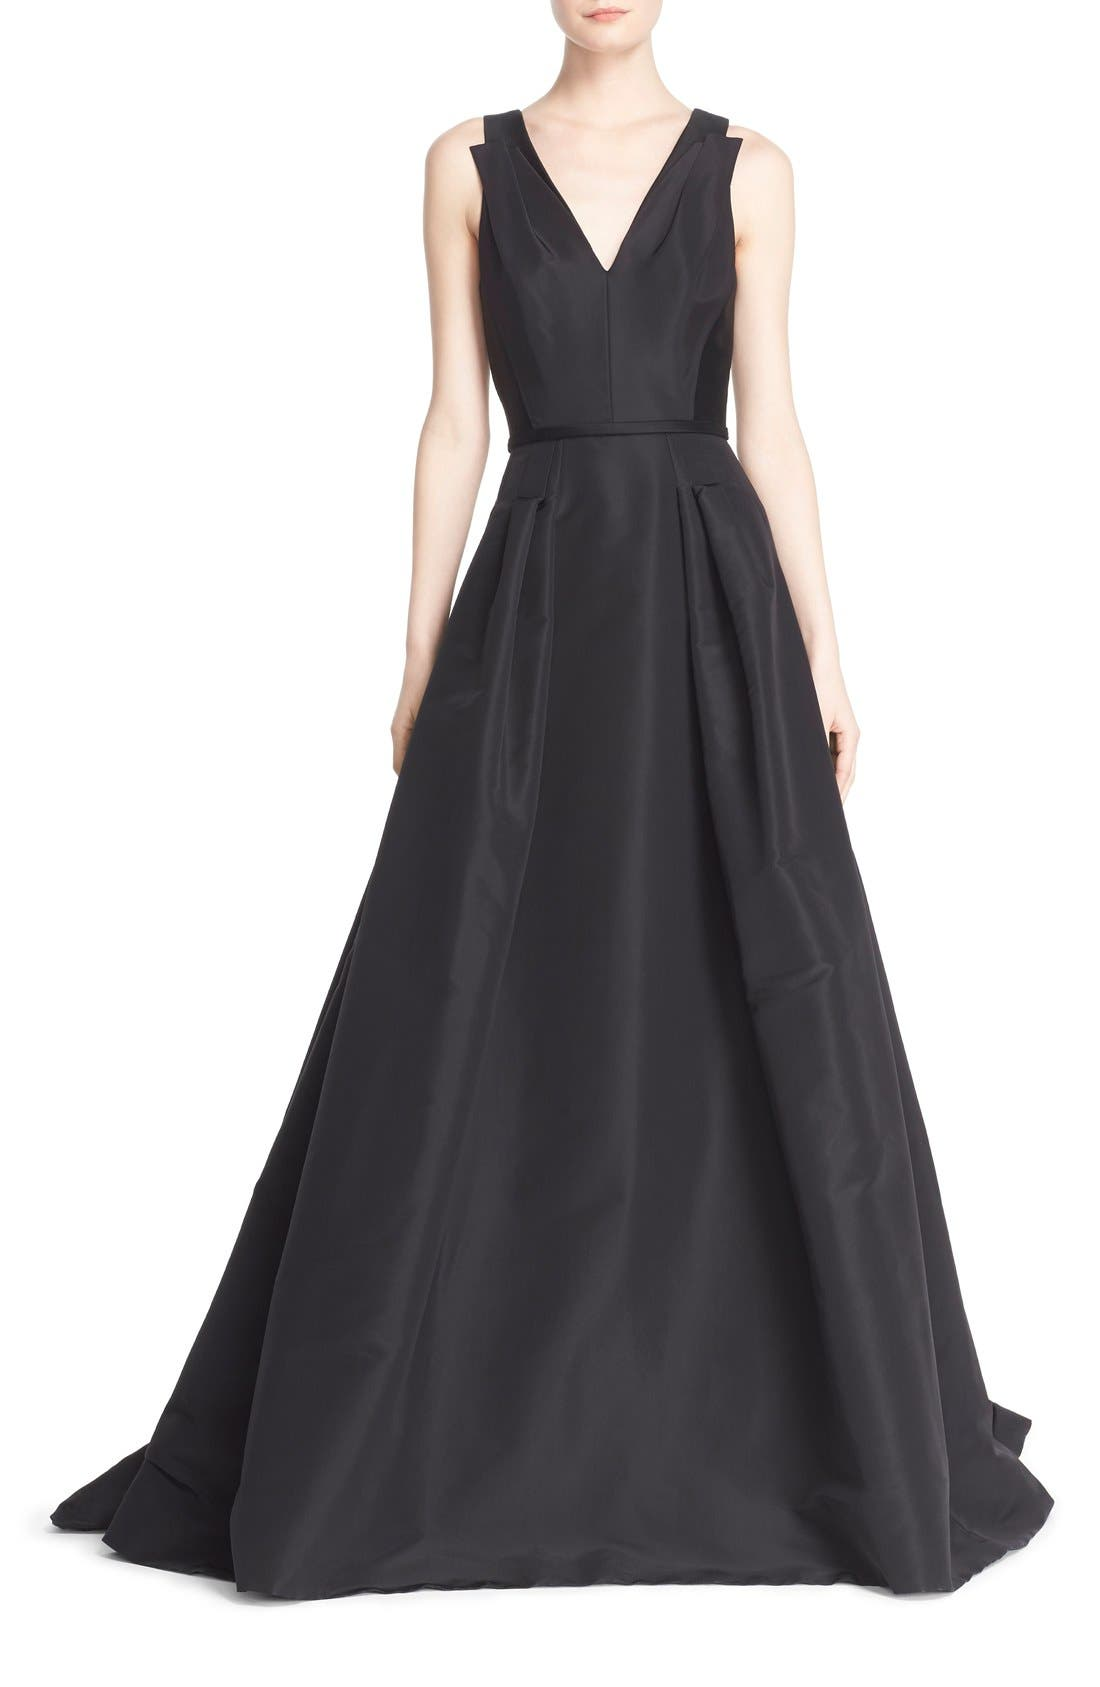 Alternate Image 1 Selected - Carolina Herrera V-Neck Silk Ballgown